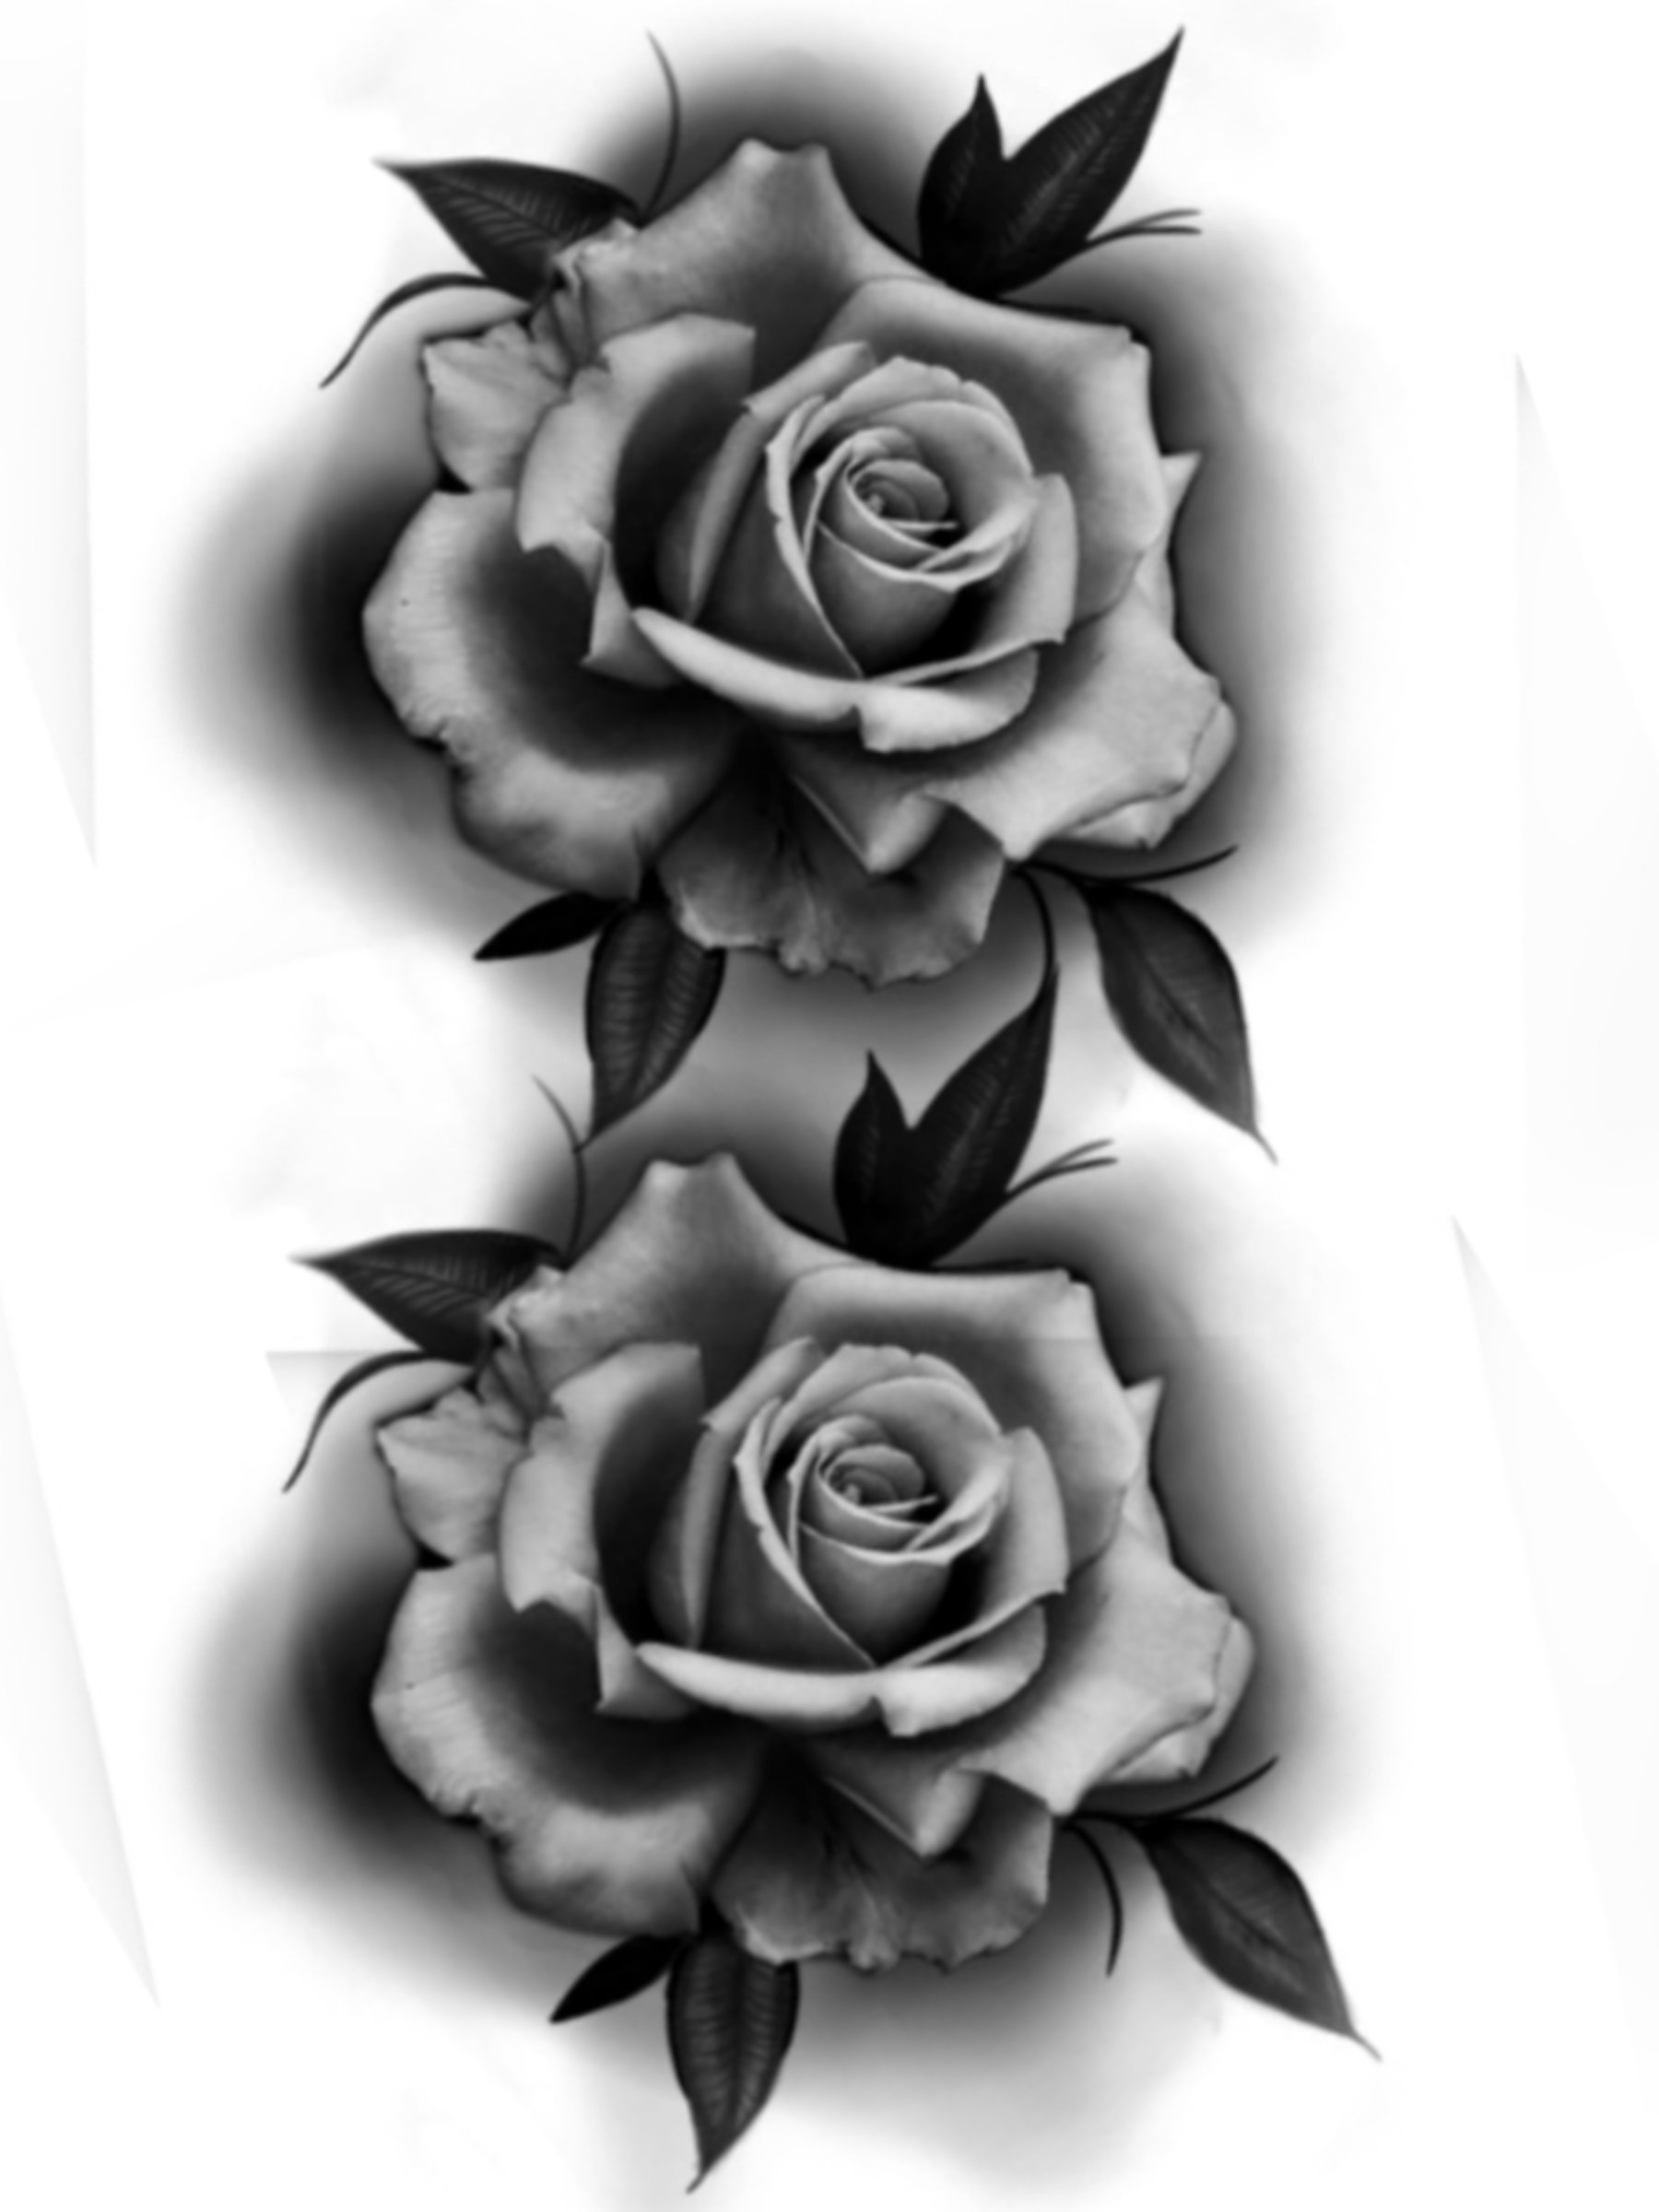 Pin By Prichu Altrui On Tattoo Rose Tattoos For Men Realistic Rose Tattoo Black Flowers Tattoo